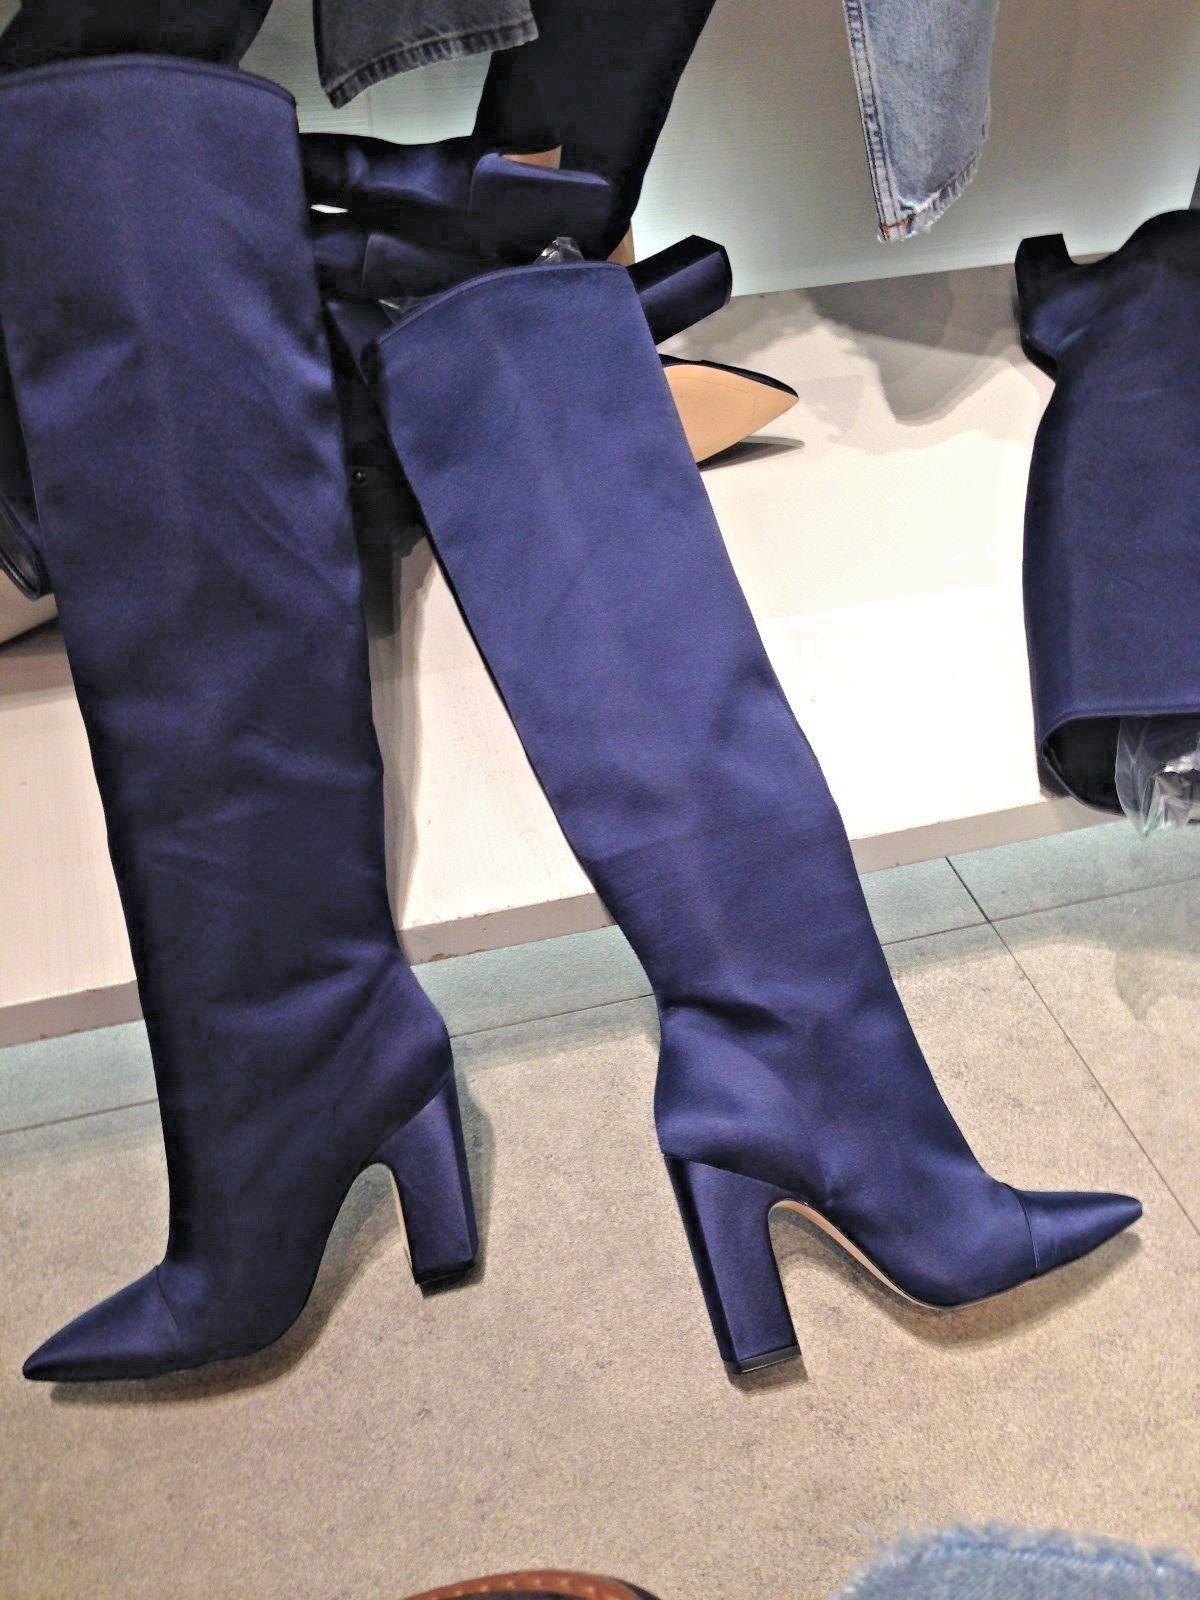 Offriamo vari marchi famosi Zara Zara Zara Blu Satin Tacco Alto Stivali FW17 Tg & 6 EUR 38 & 39 nuovi contrassegni  Senza tasse